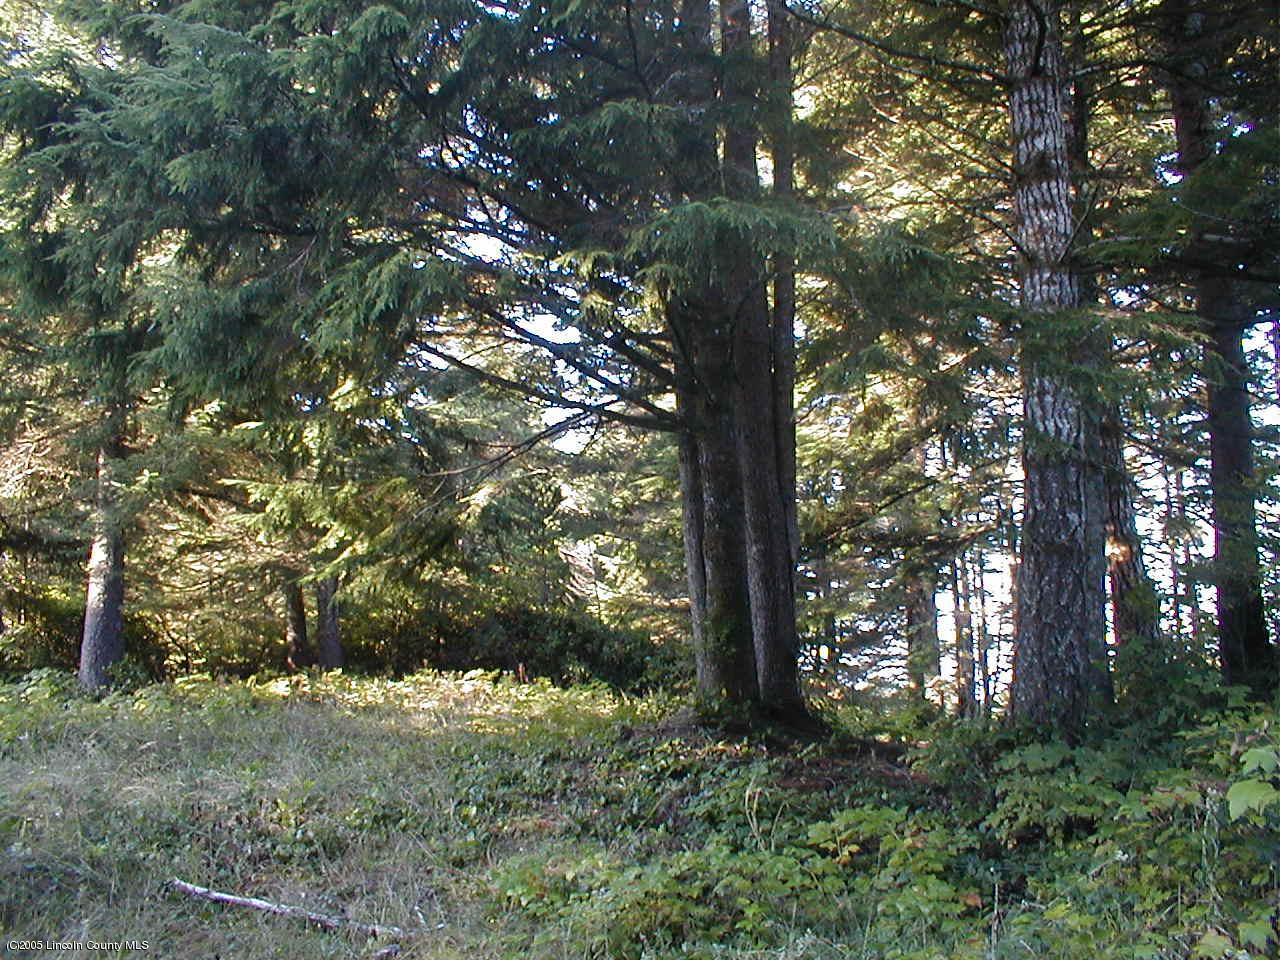 705 Highland # 707 Cir, Waldport, OR 97394 - Rucker Land